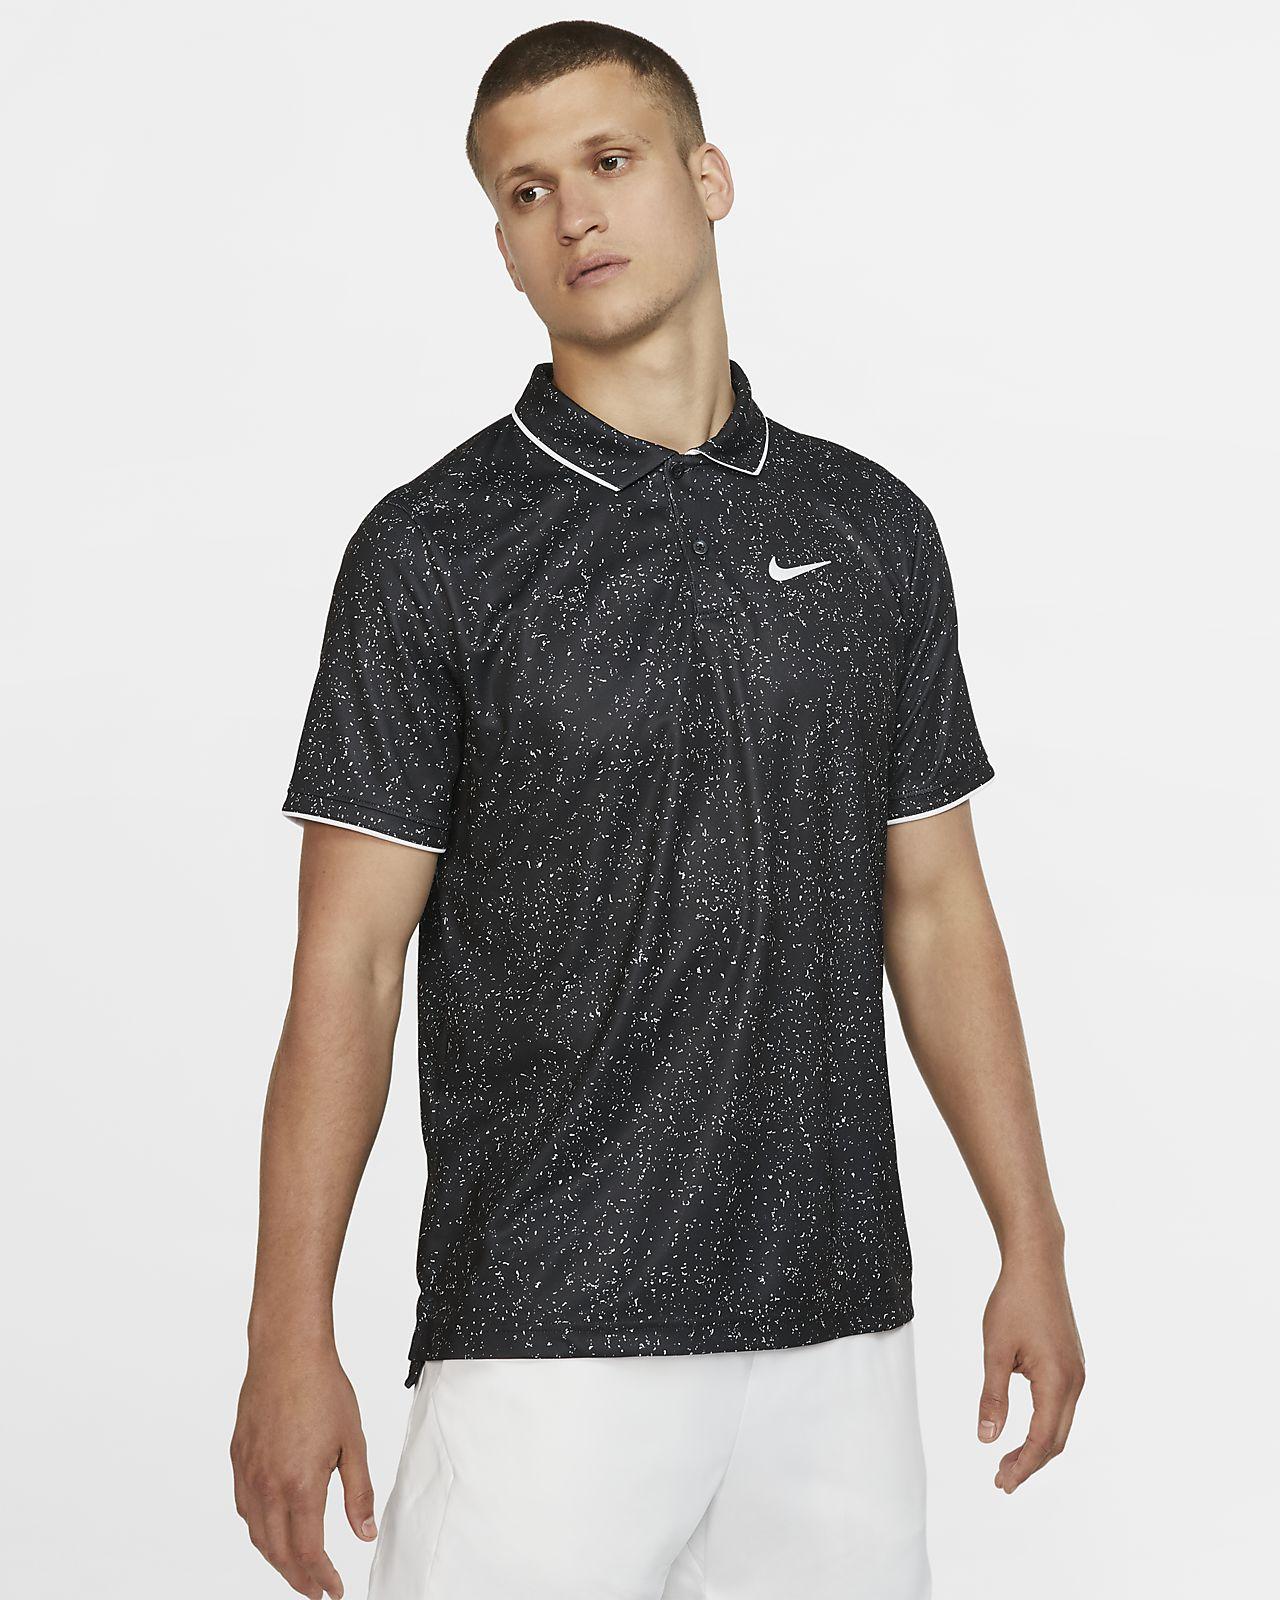 Camiseta polo de tenis estampada para hombre NikeCourt Dri-FIT